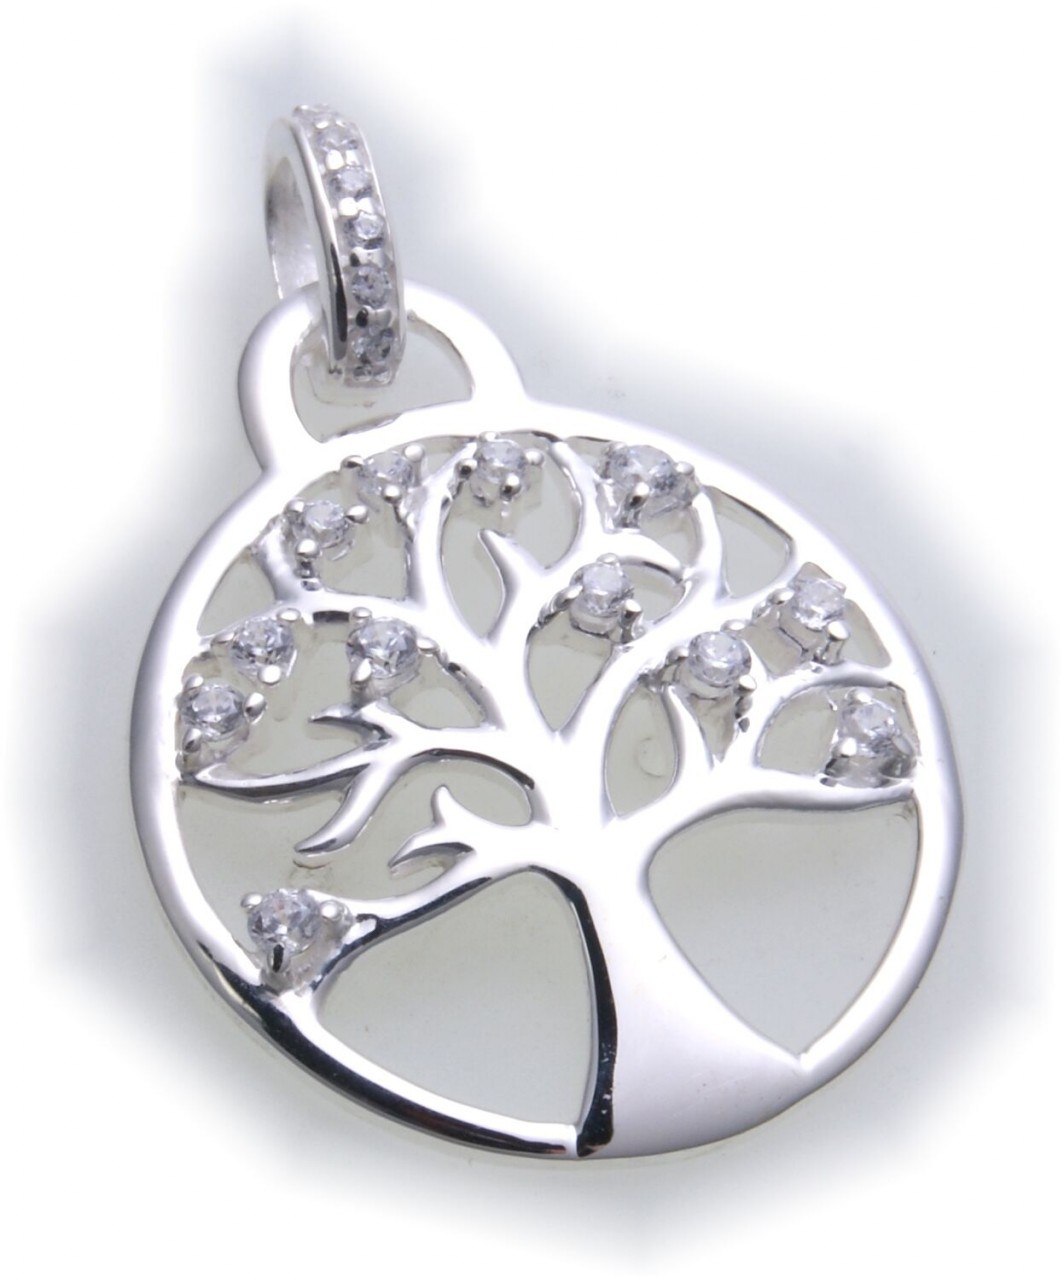 Anhänger Baum des Lebens in Silber 925 Sterlingsilber mit Zirkonia